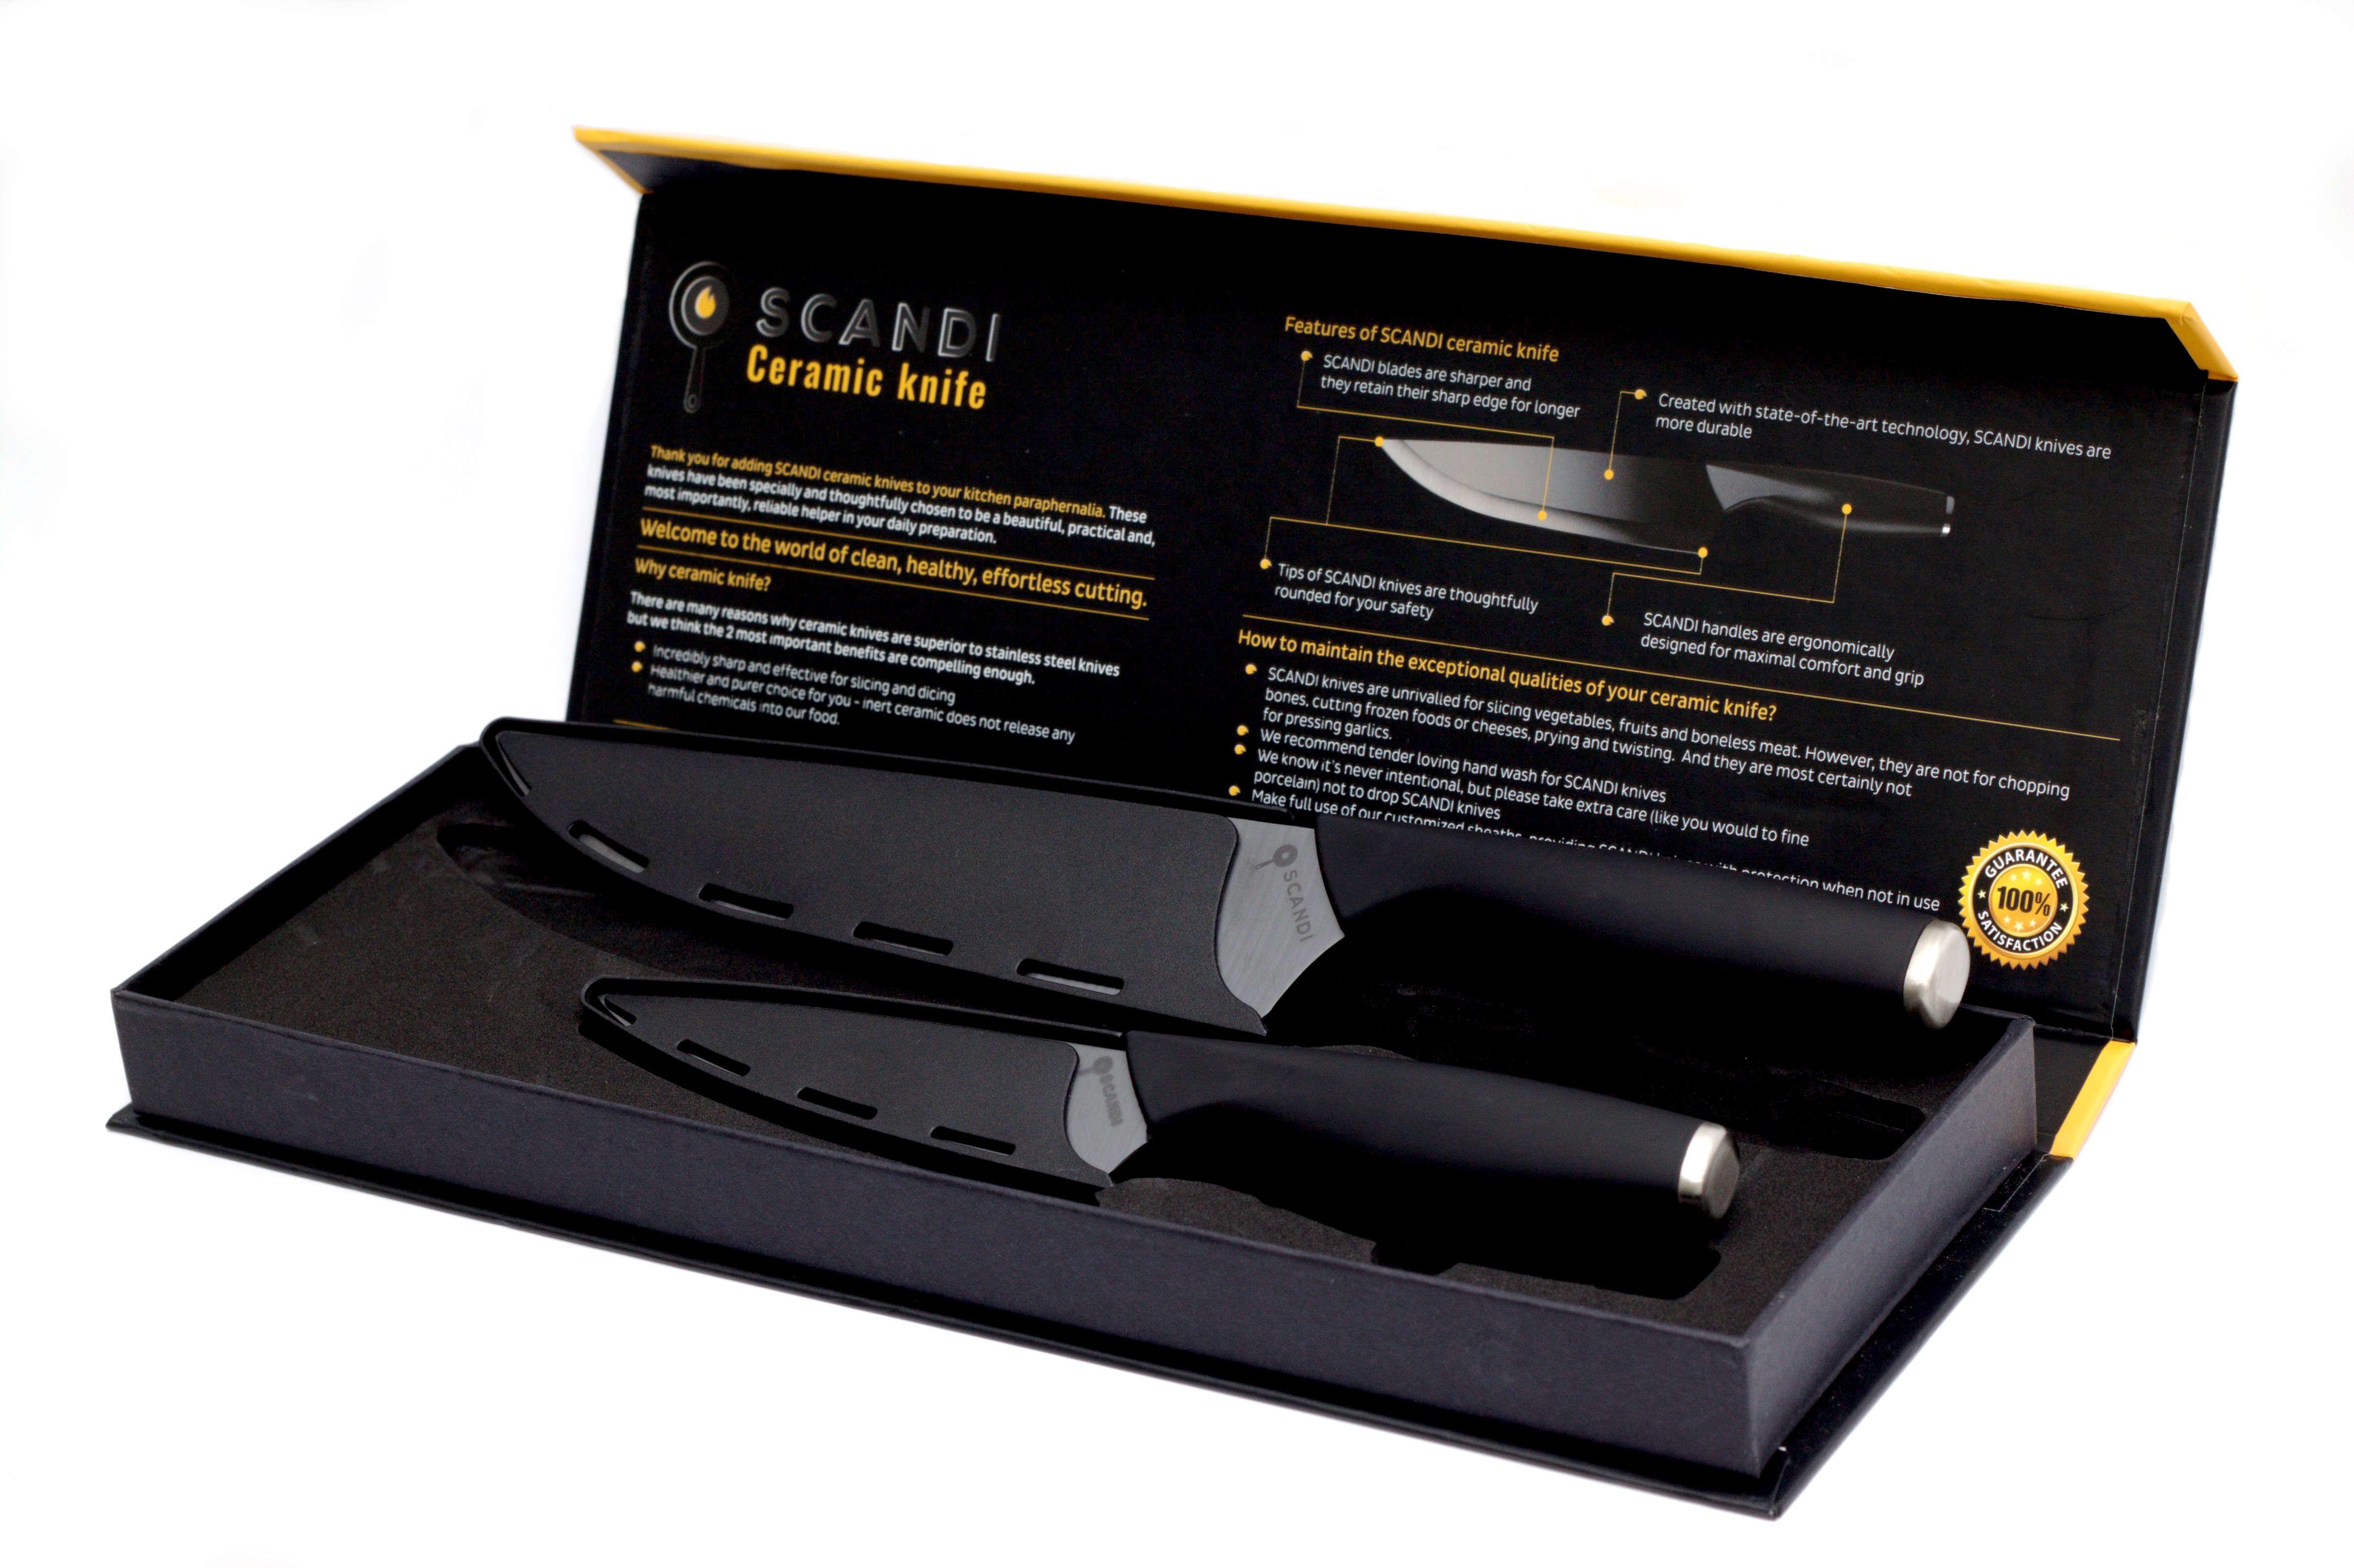 SCANDI Ceramic Knife Set Review